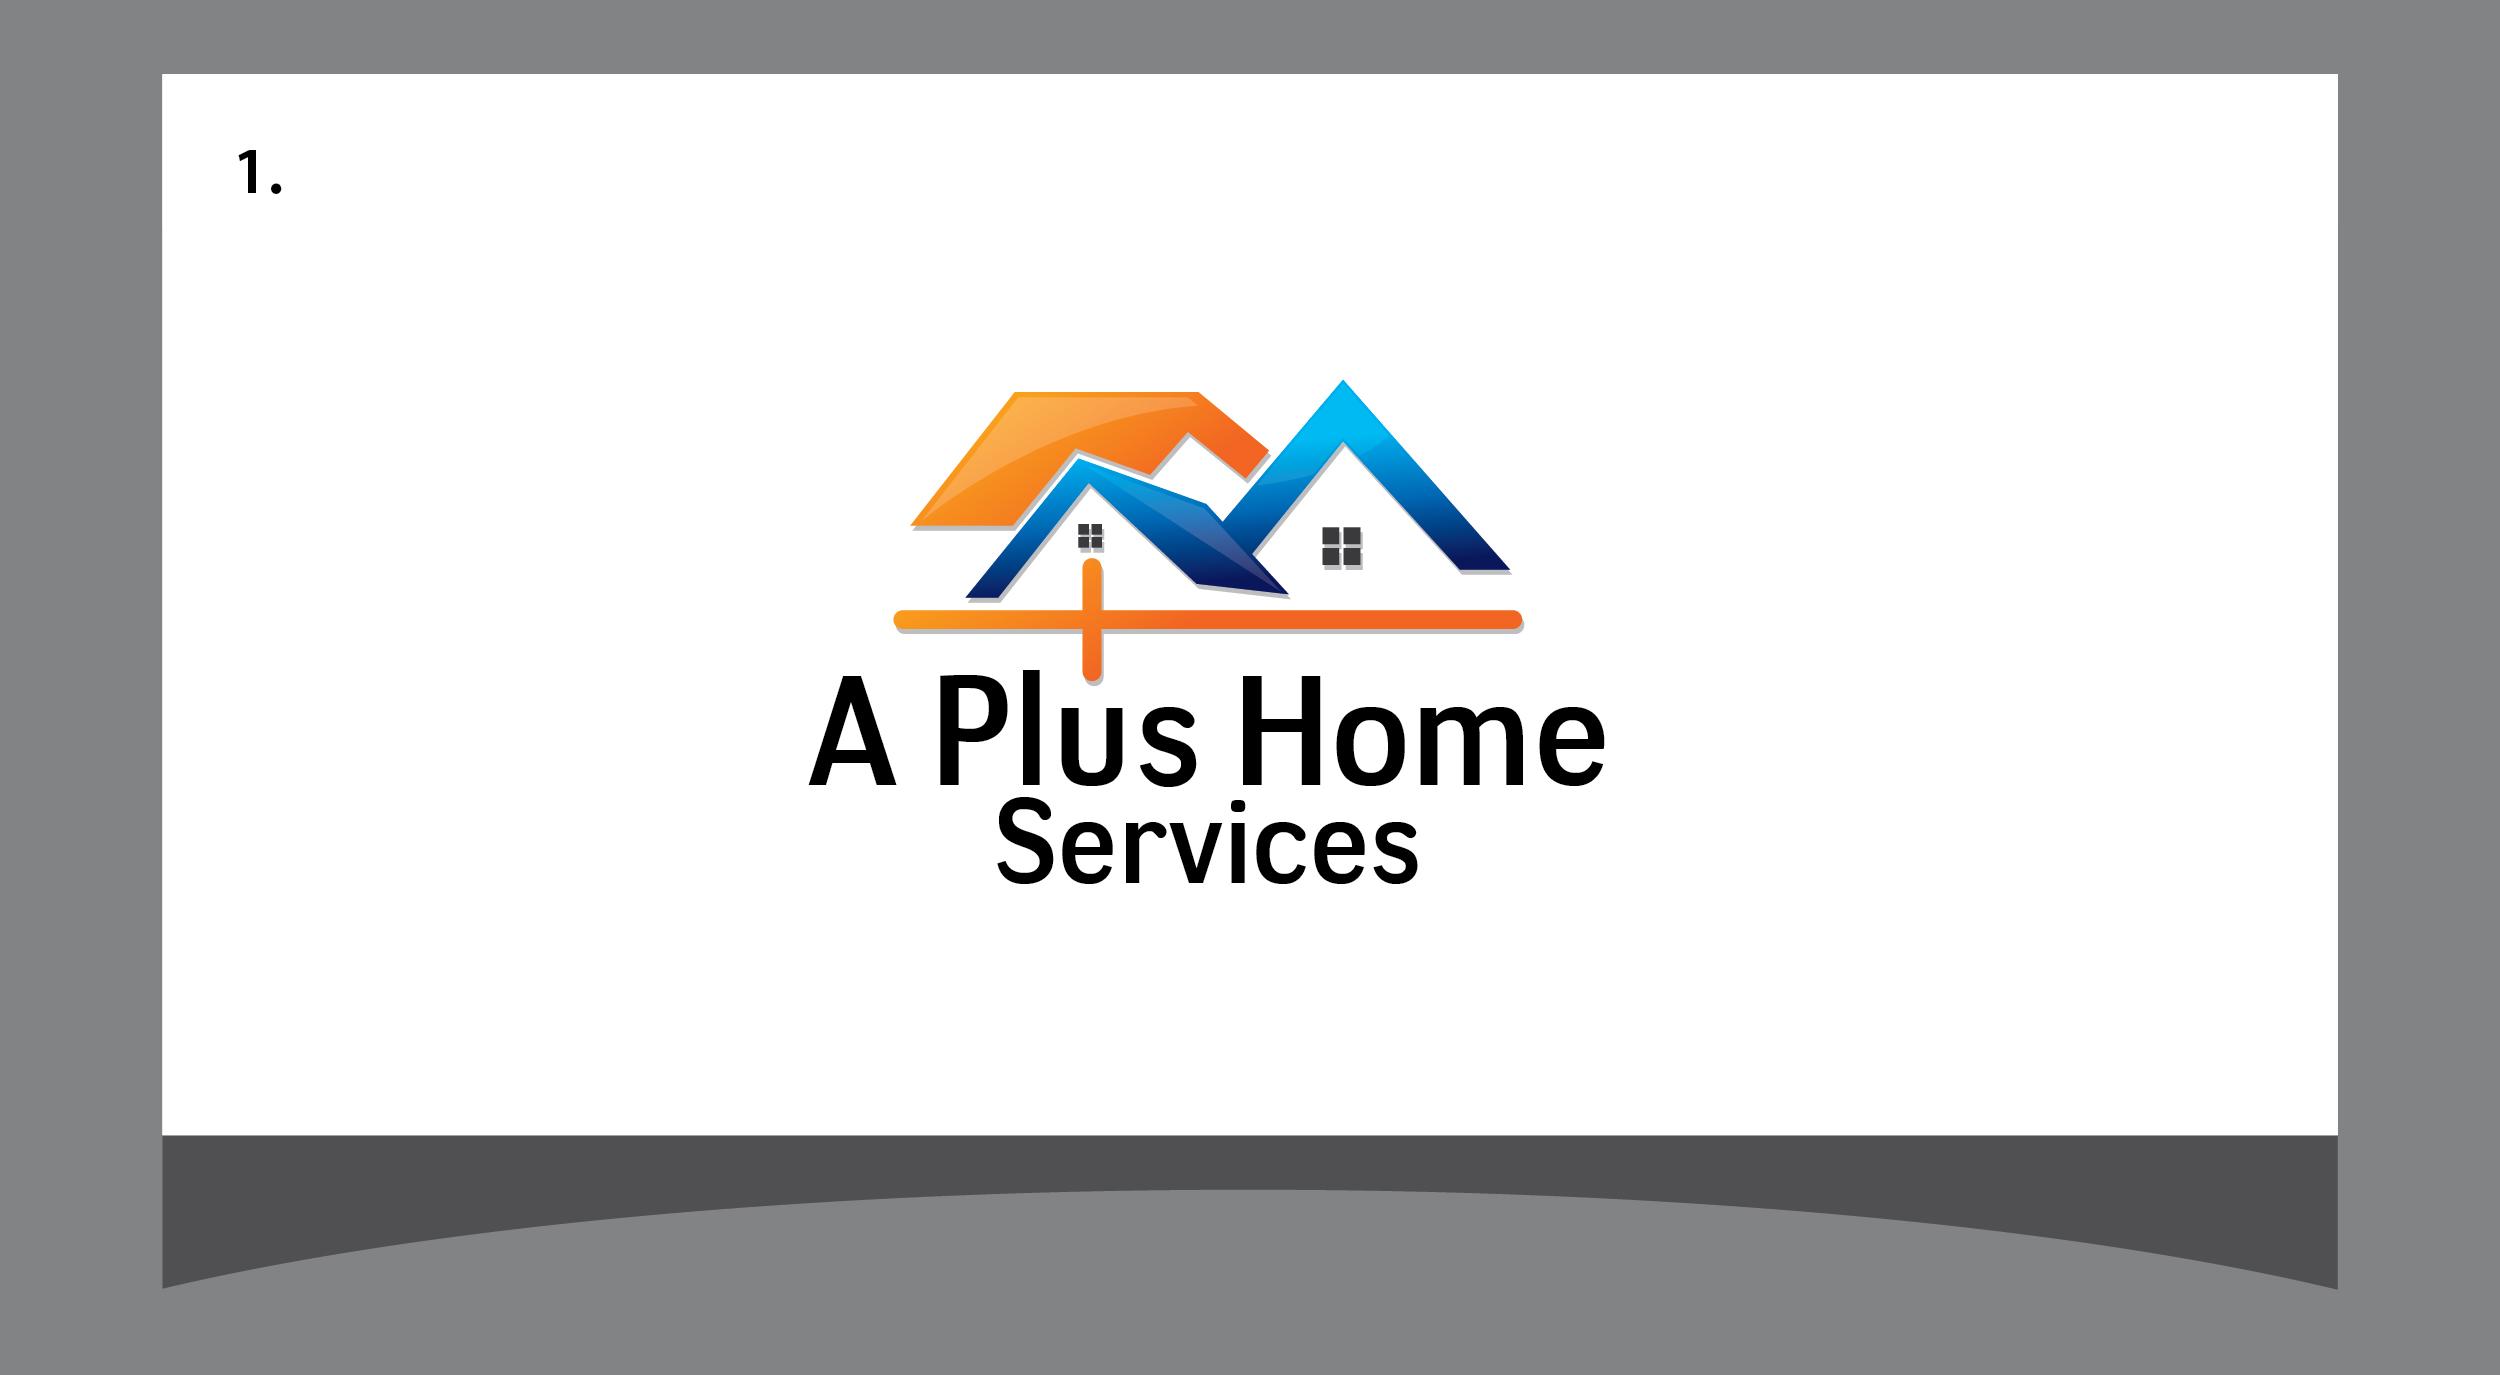 A Plus Home Services logo